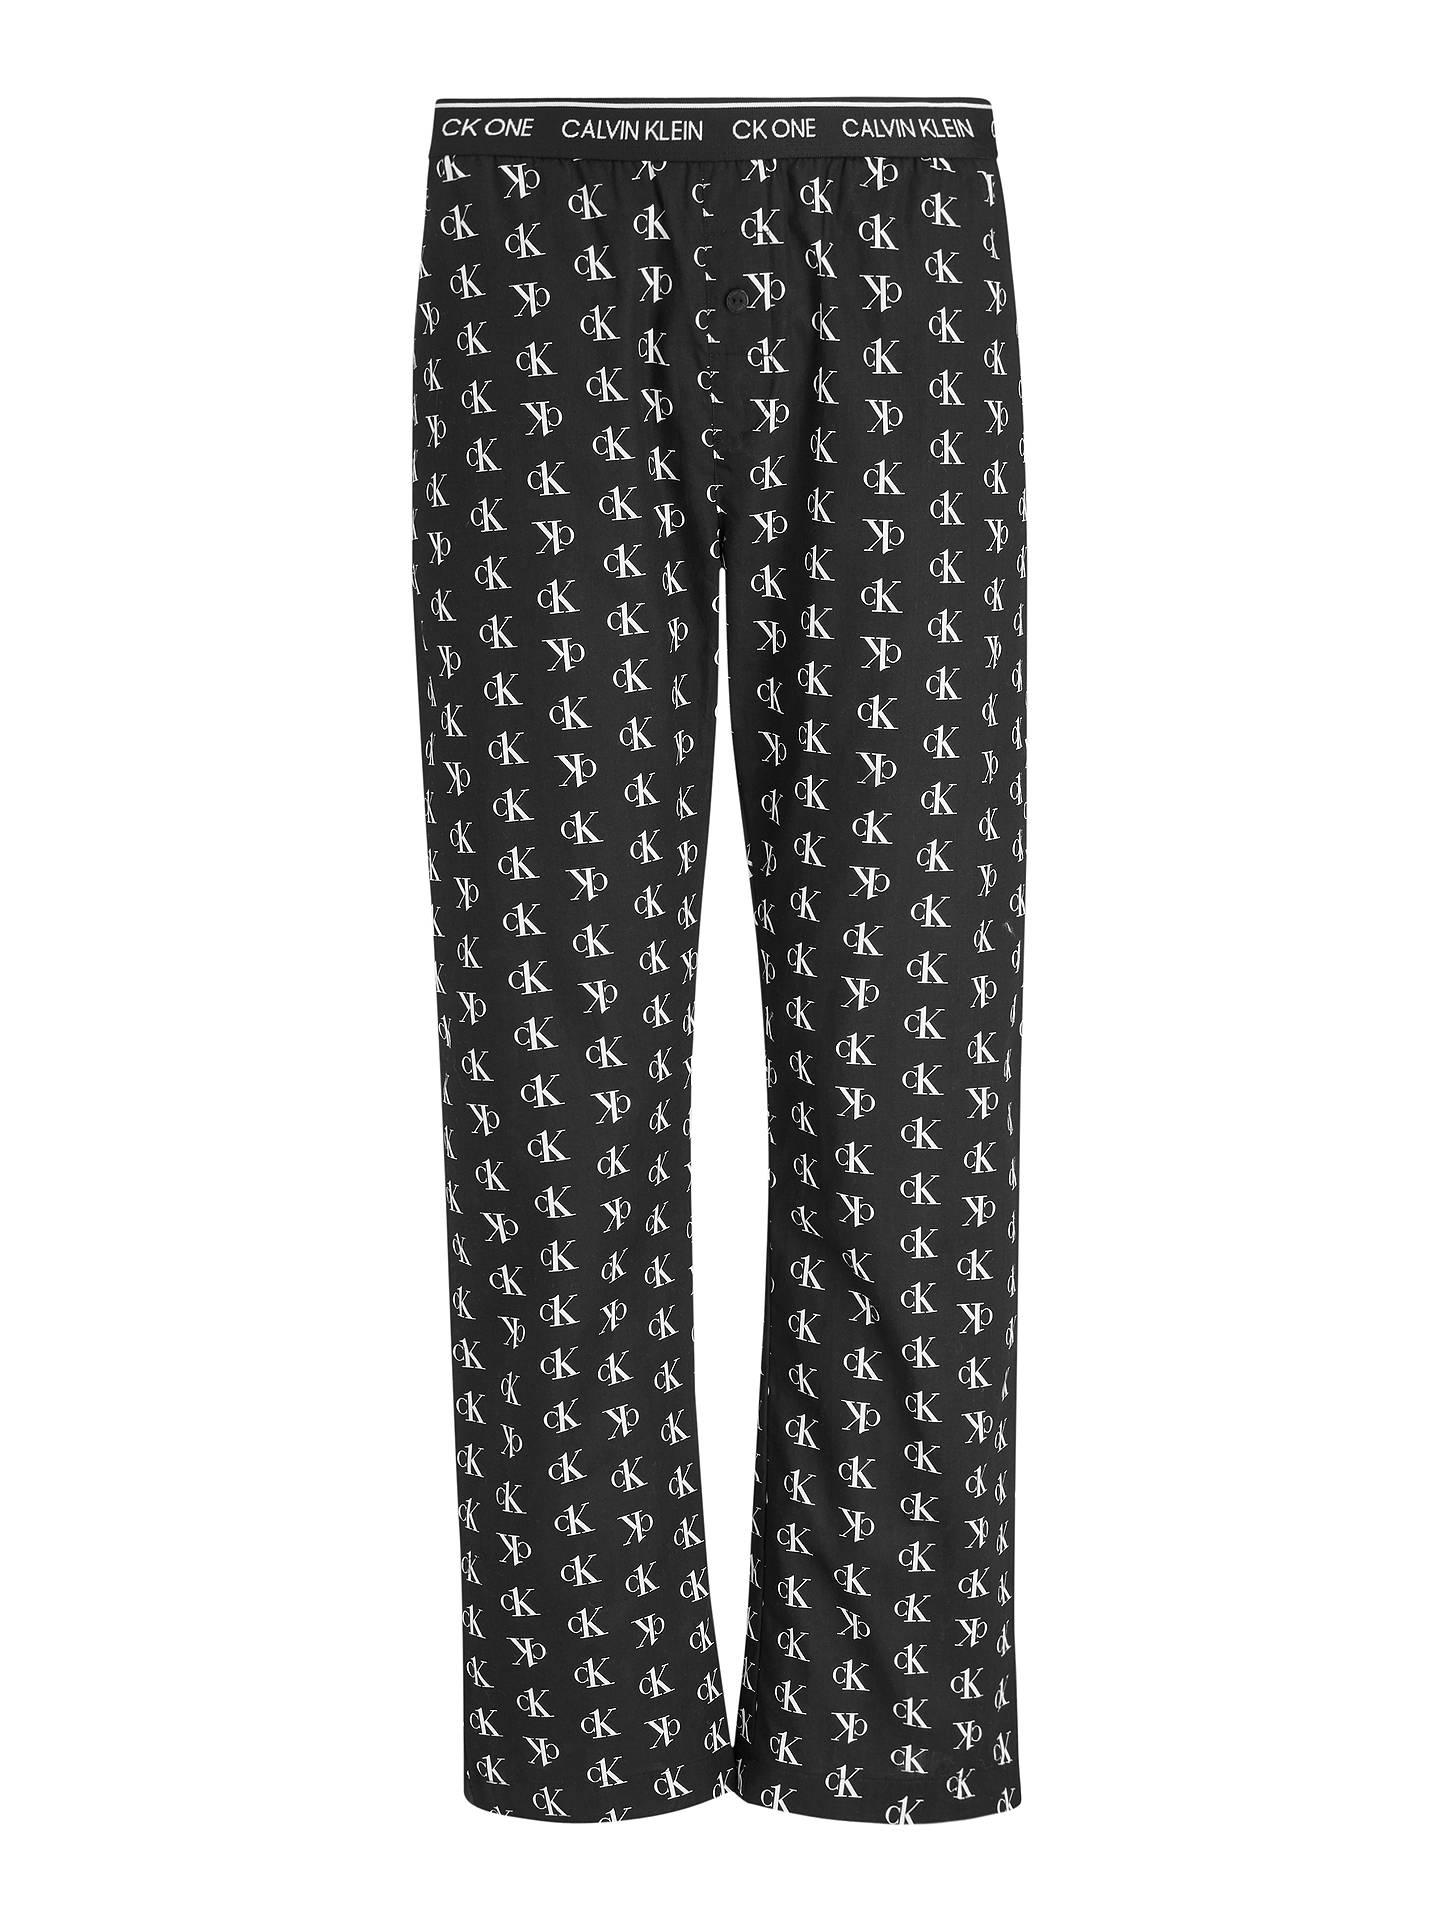 Calvin Klein CK One Woven Cotton Pyjama